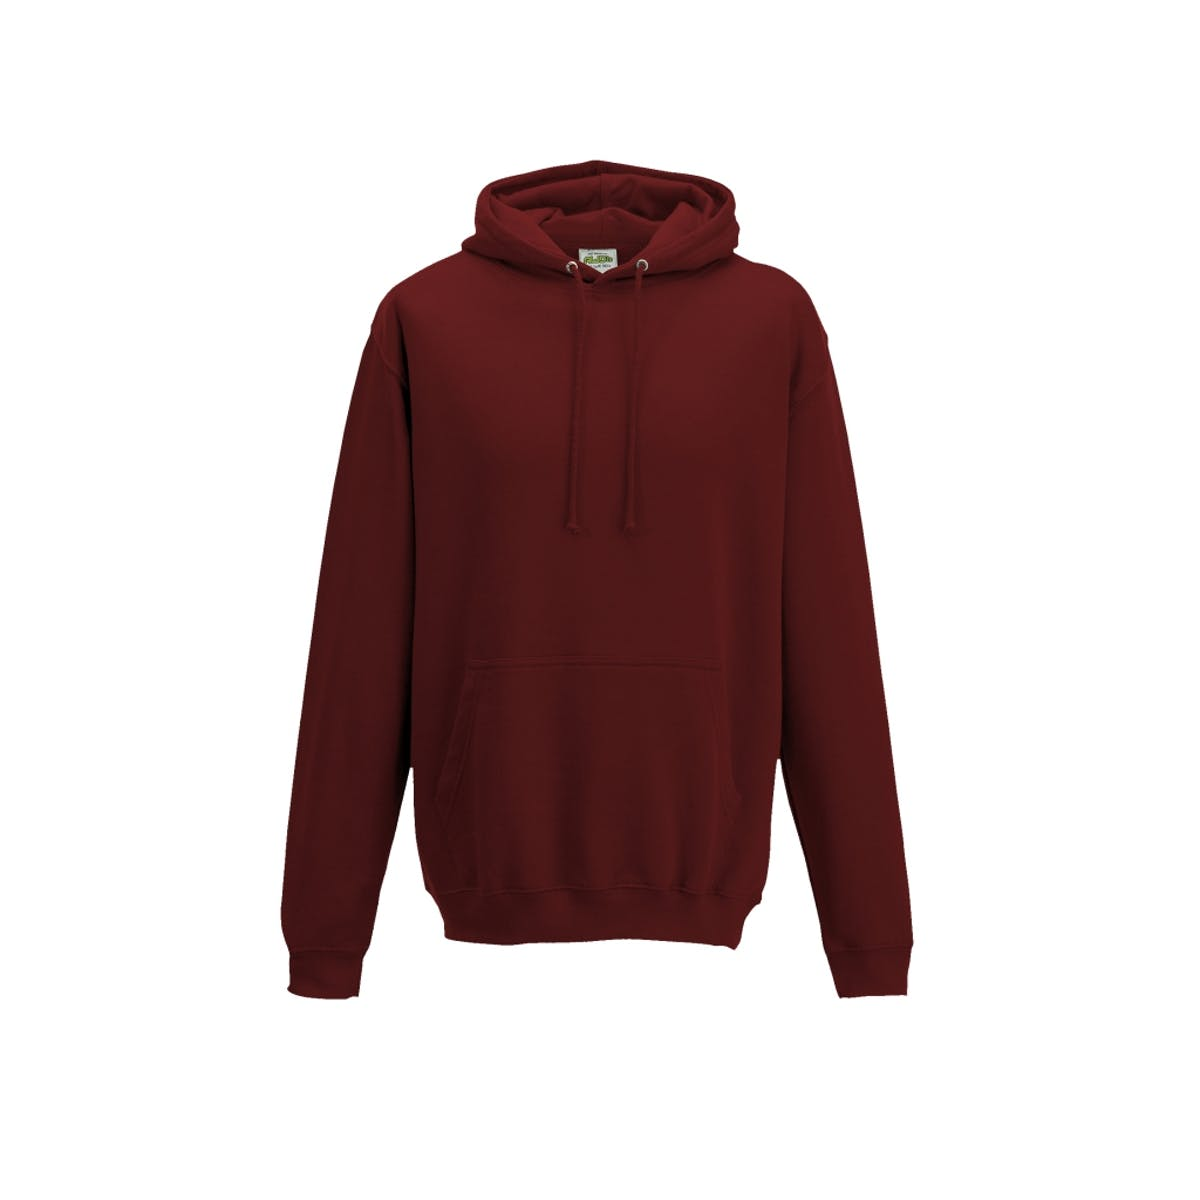 brick red overhead college hoodies